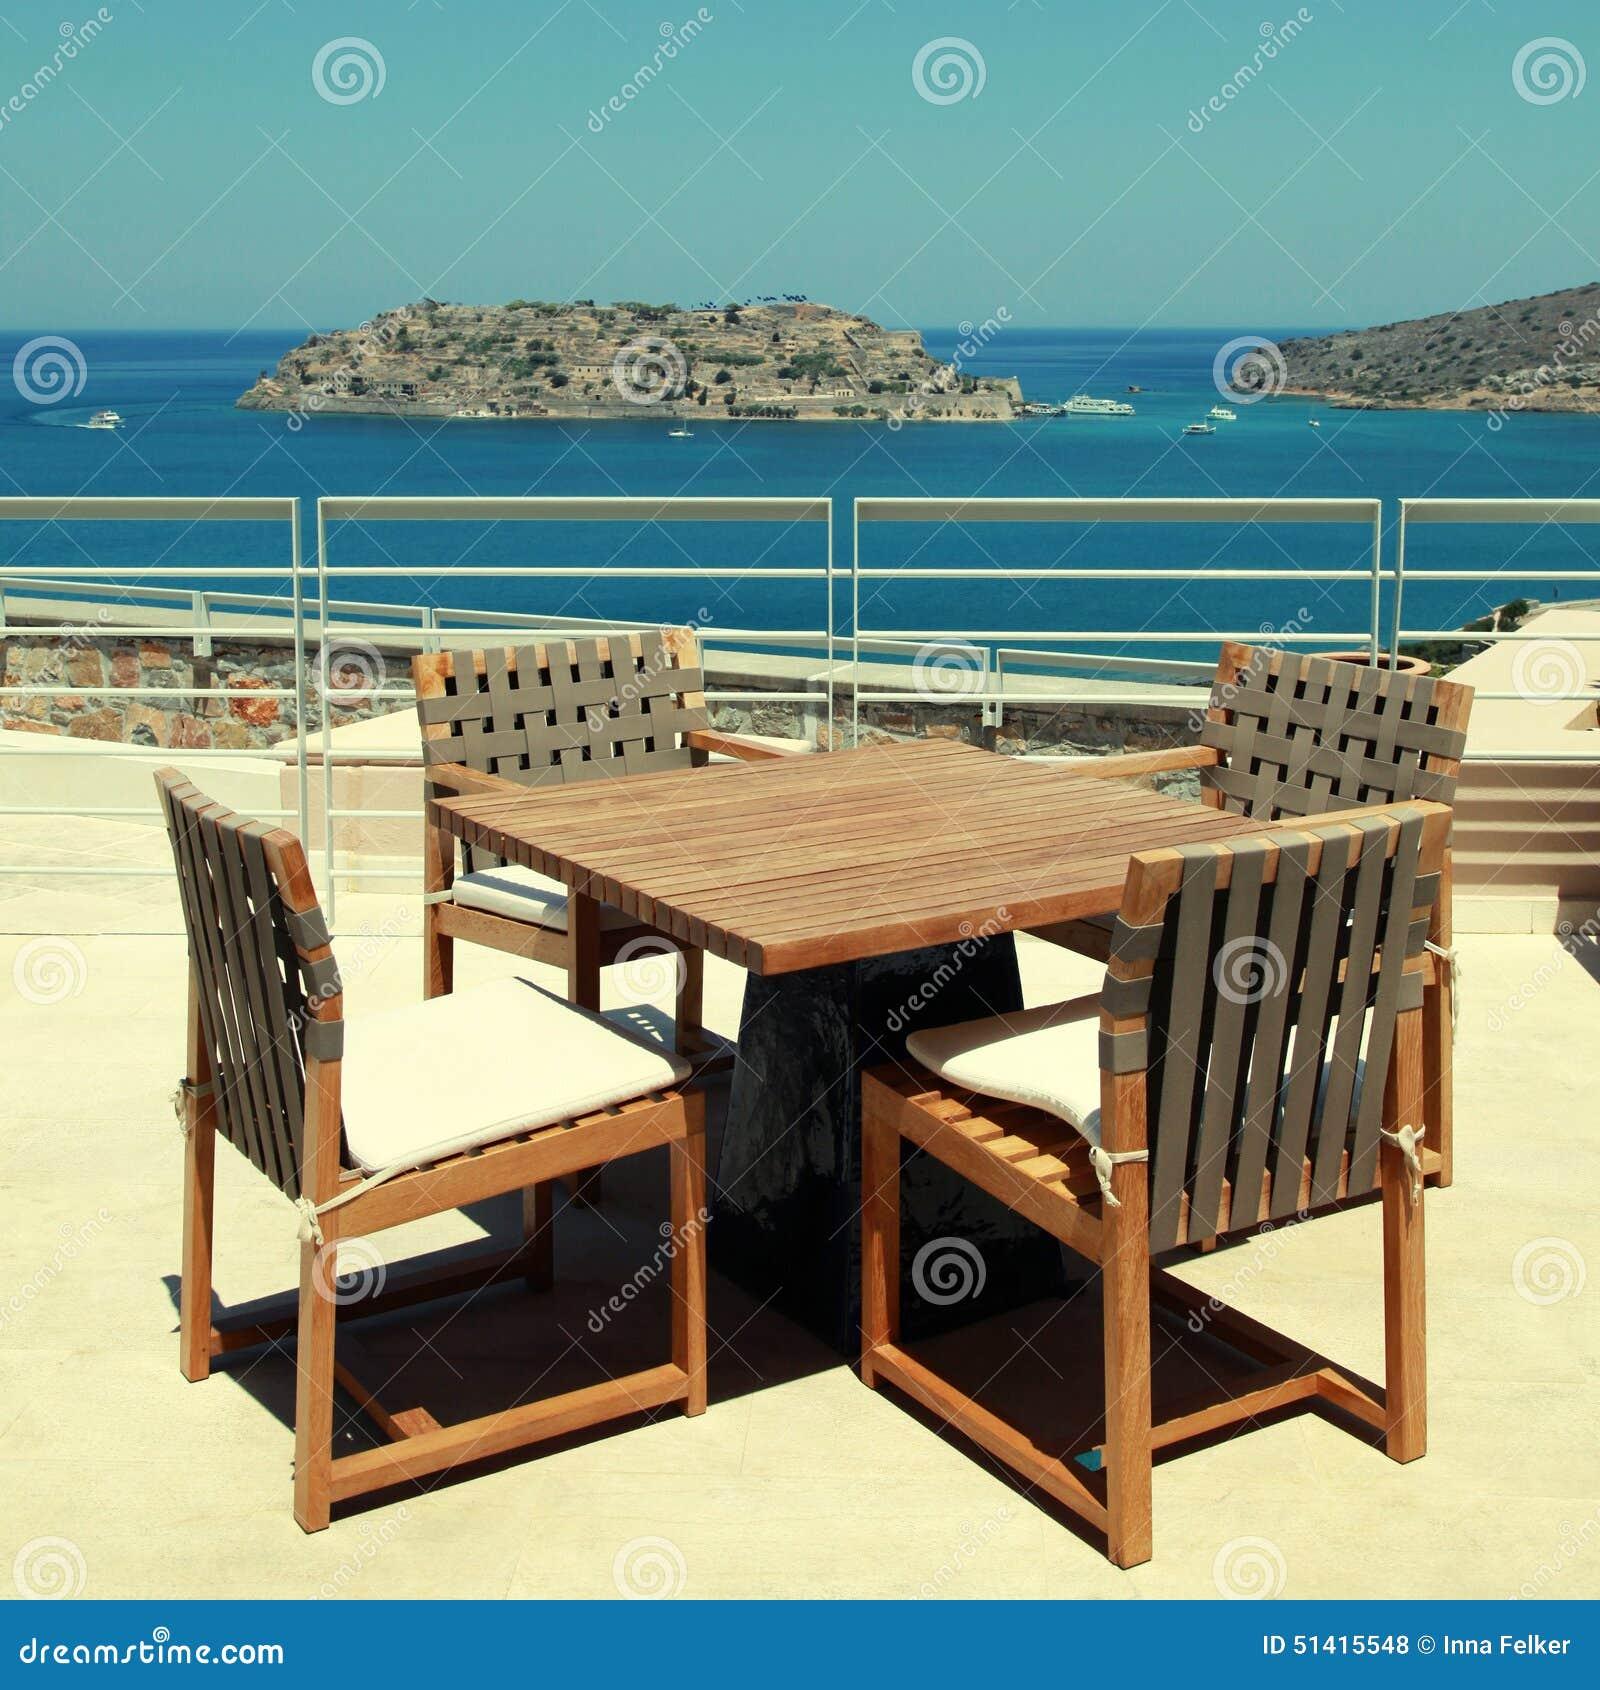 Terrace seaview with outdoor furniture in a luxury resortcrete greece